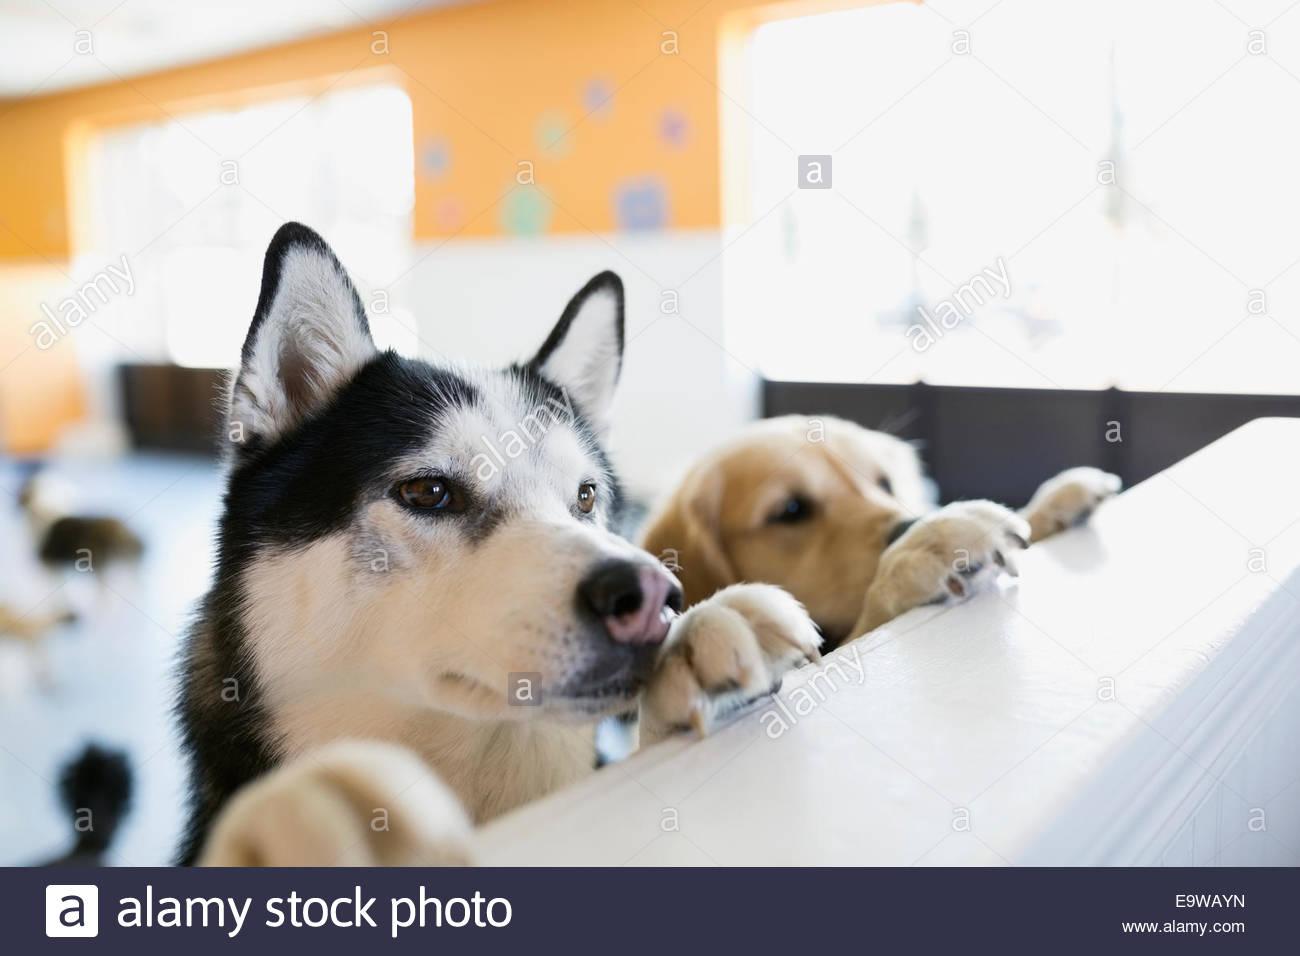 Neugierige Hunde auf Hund Kindertagesstätten Theke gelehnt Stockbild